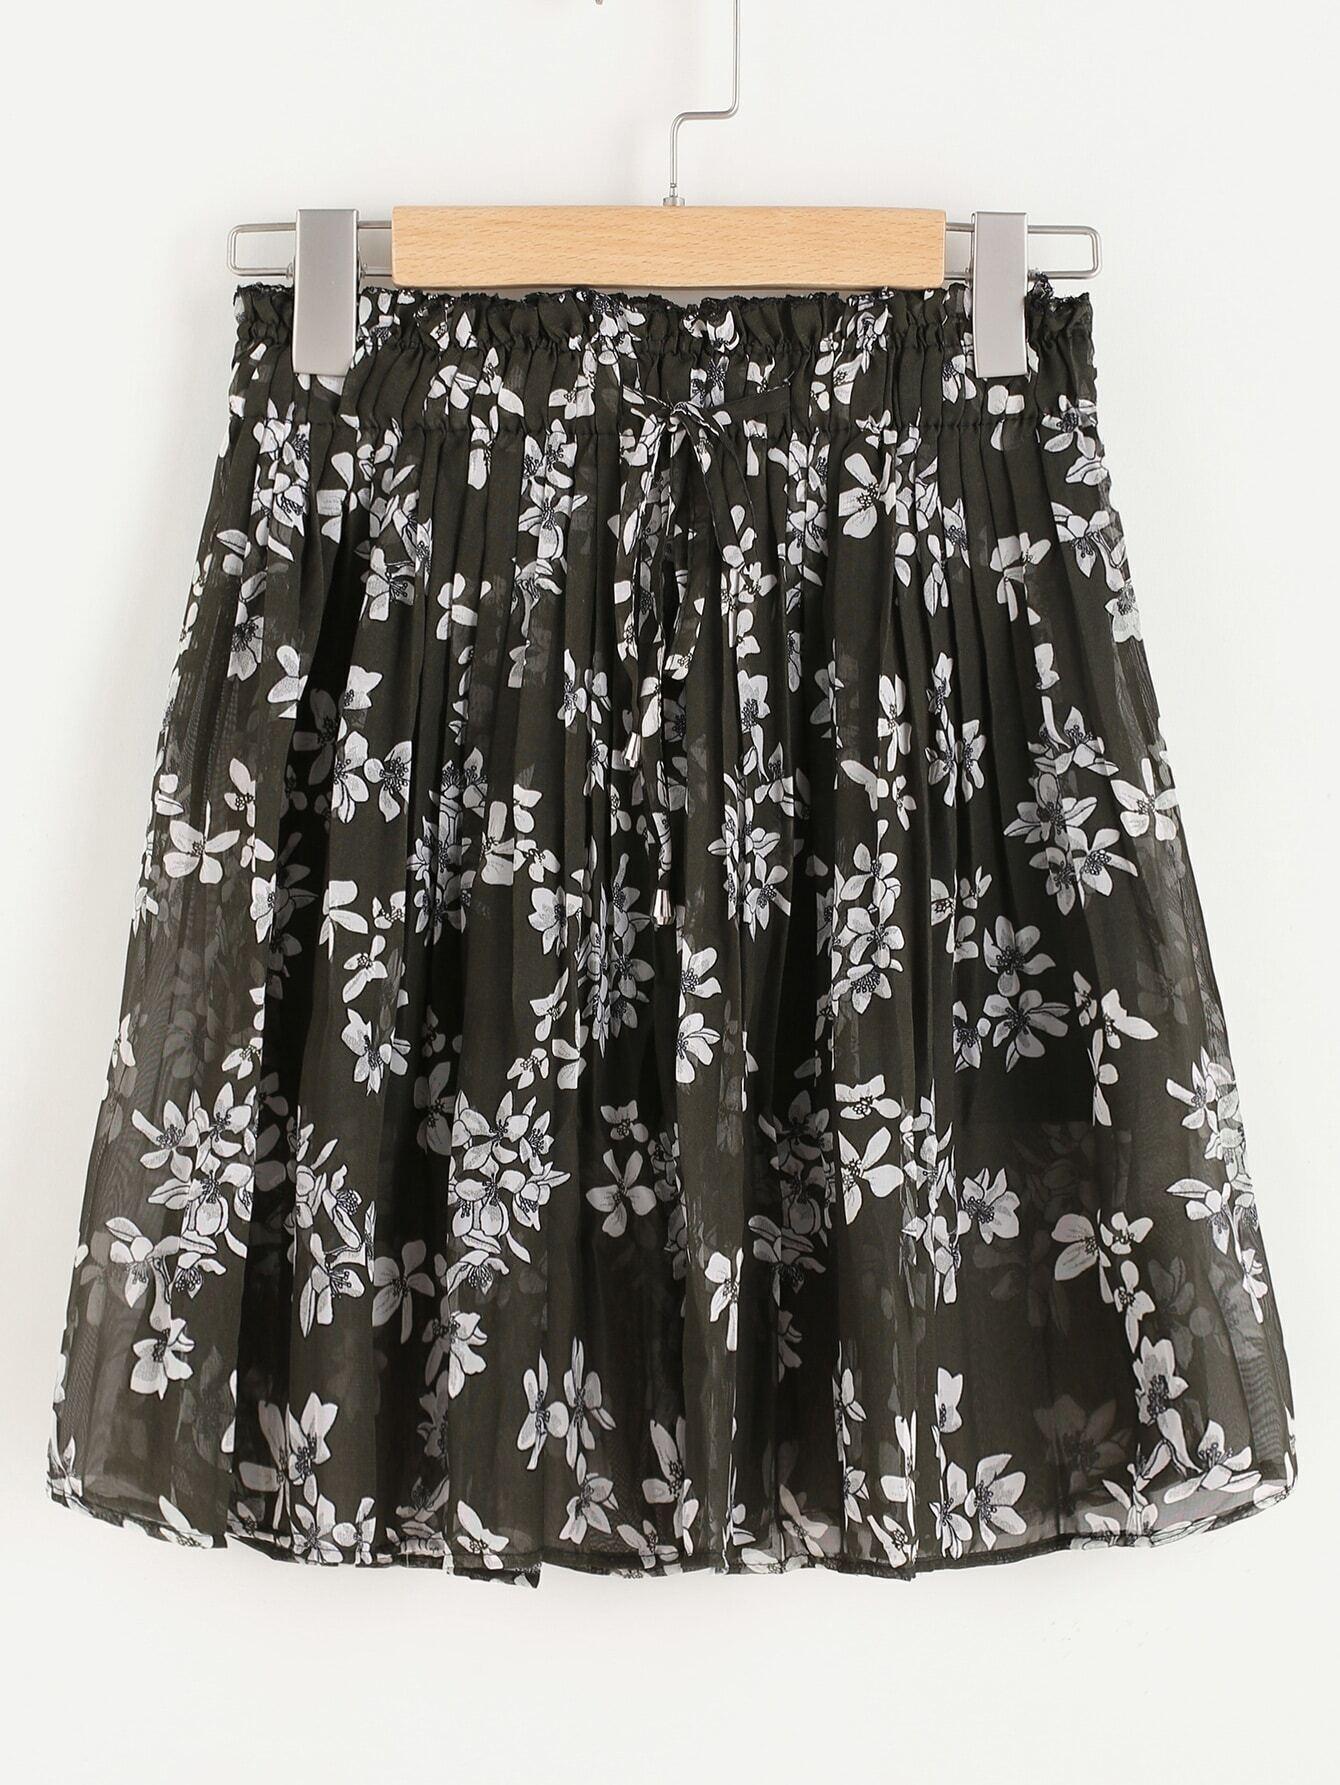 Ditsy Print Random Drawstring Waist Chiffon Skirt